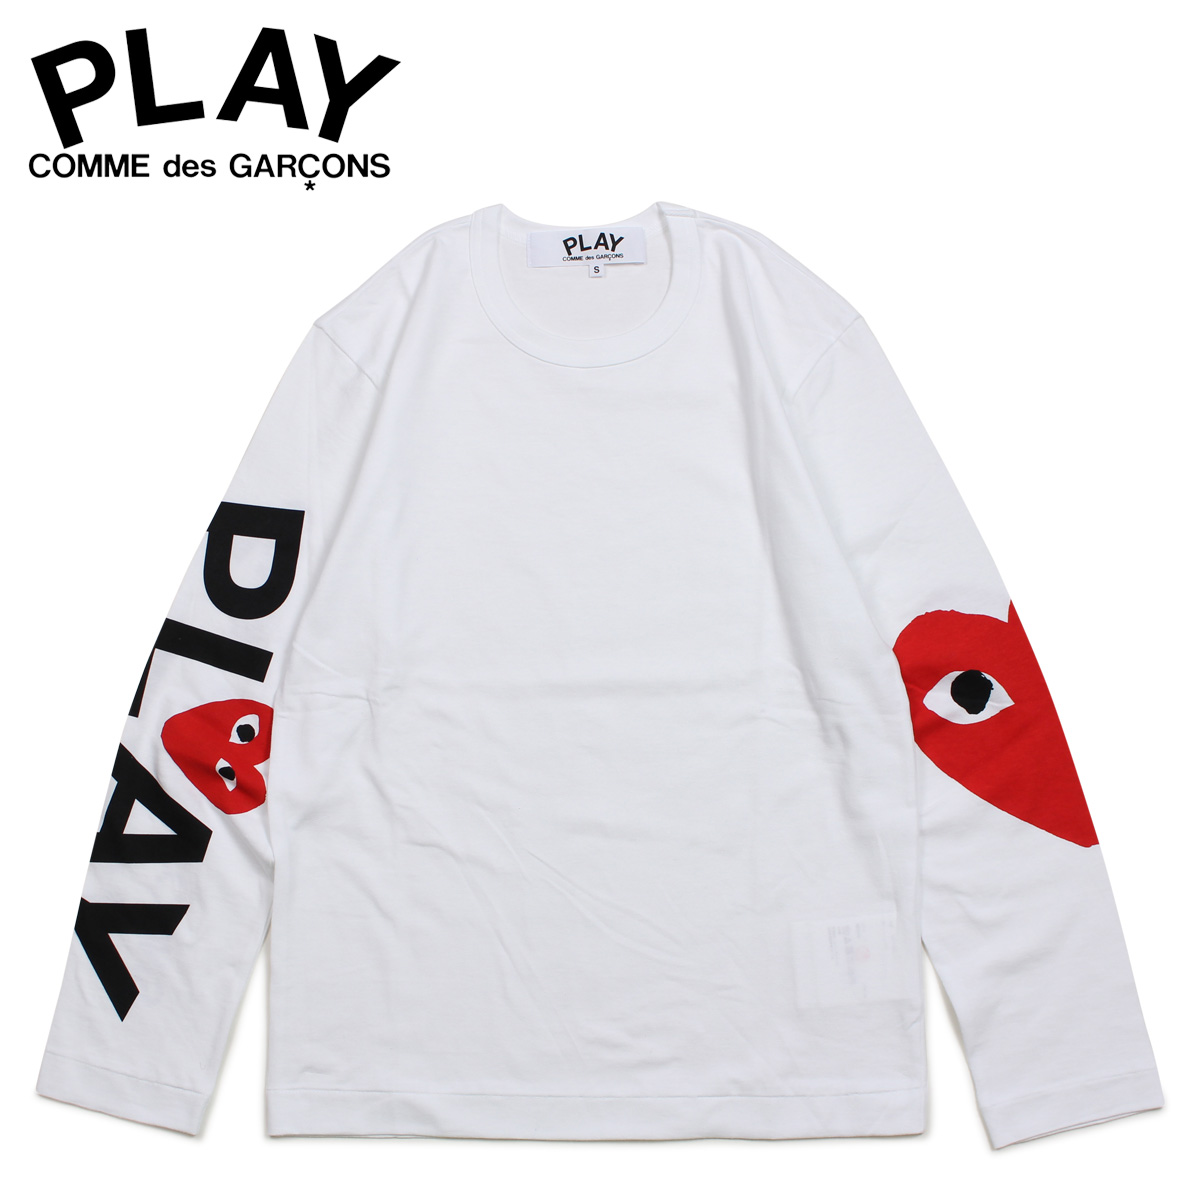 PLAY COMME des GARCONS RED HEART LONG SLEEVE コムデギャルソン Tシャツ メンズ 長袖 ロンT ホワイト 白 AZ-T258 [4/1 新入荷]